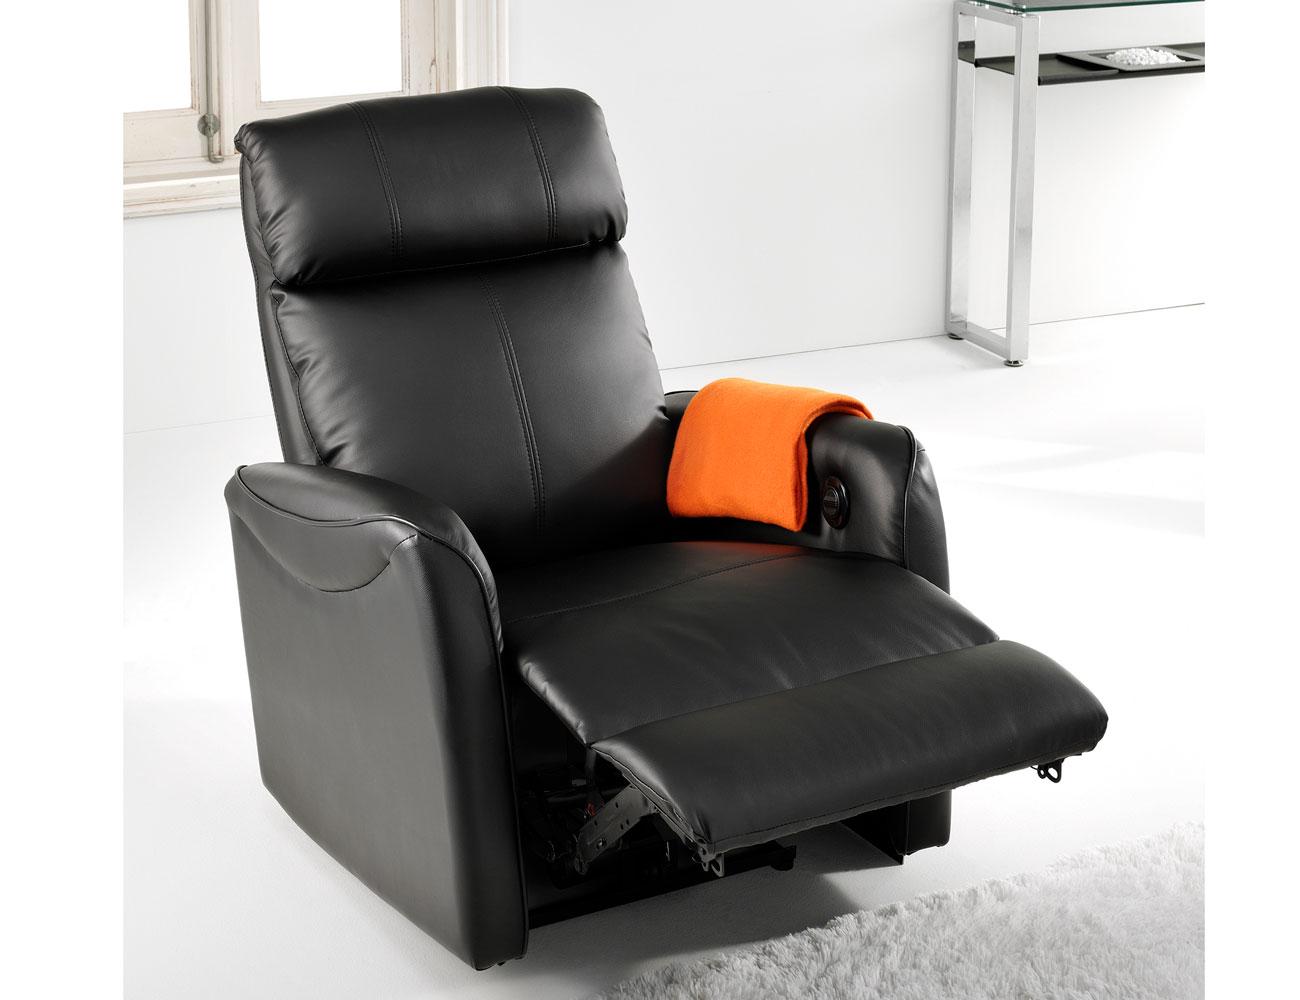 Sillon relax motor simil piel 2